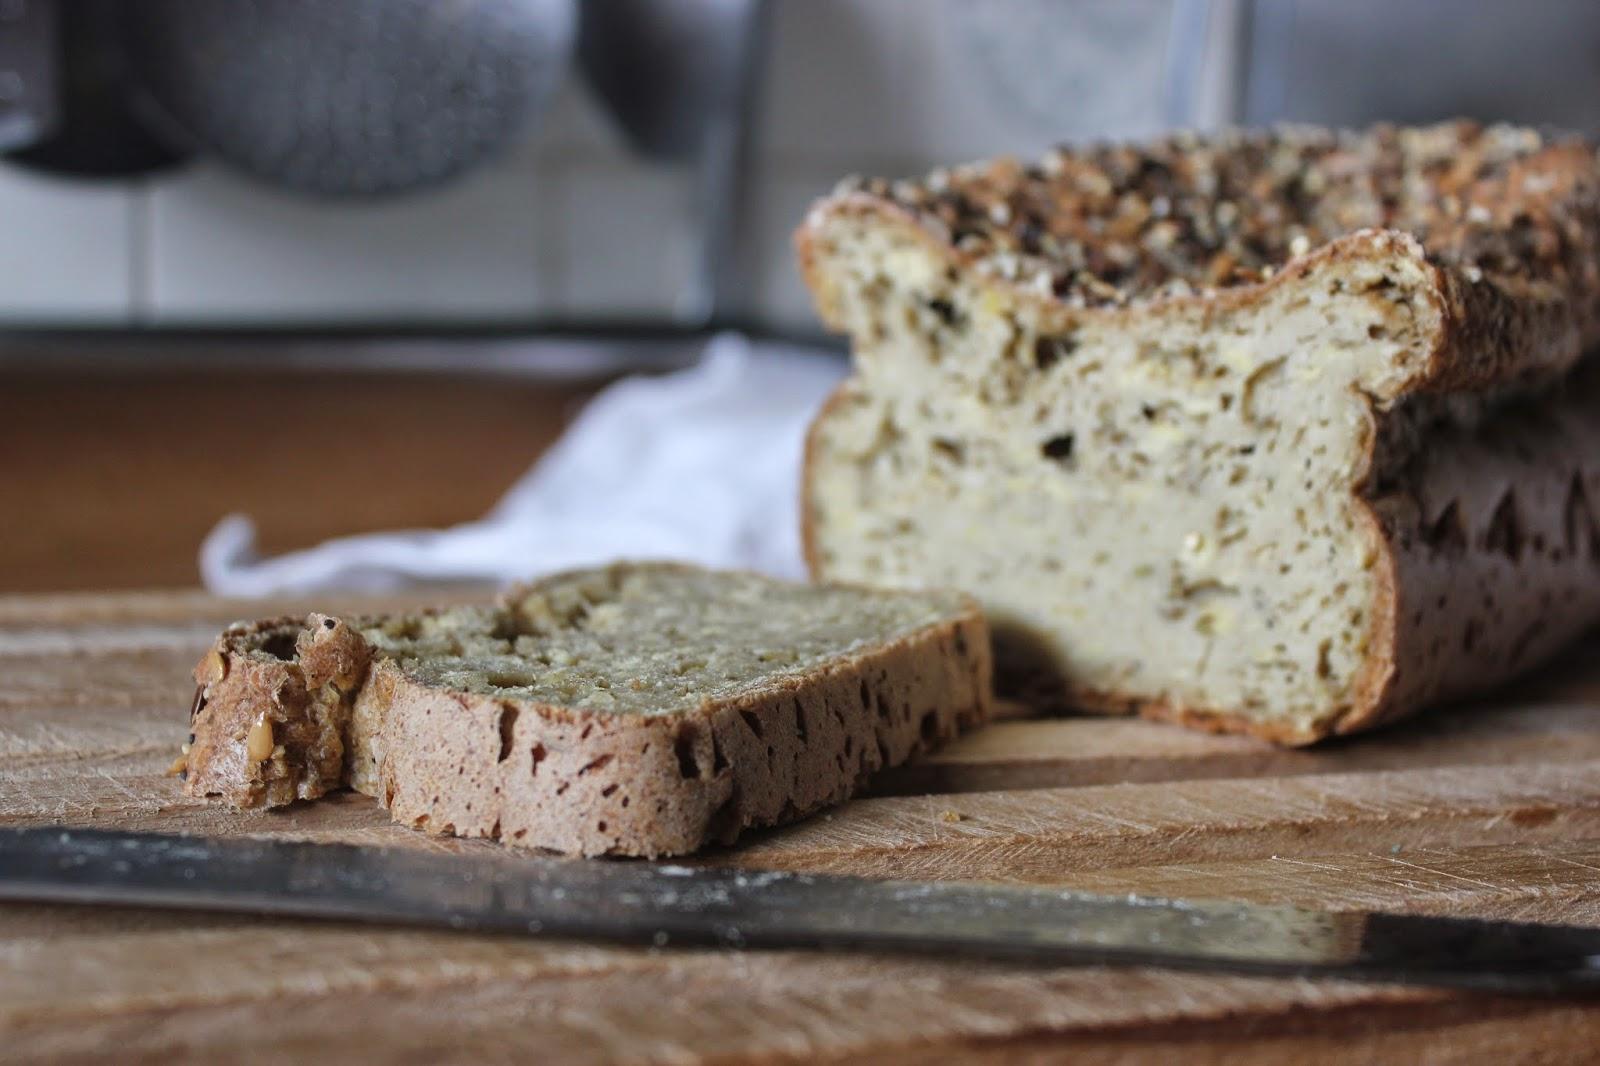 https://cuillereetsaladier.blogspot.com/2014/10/pain-blanc-sans-gluten-au-psyllium-ig.html